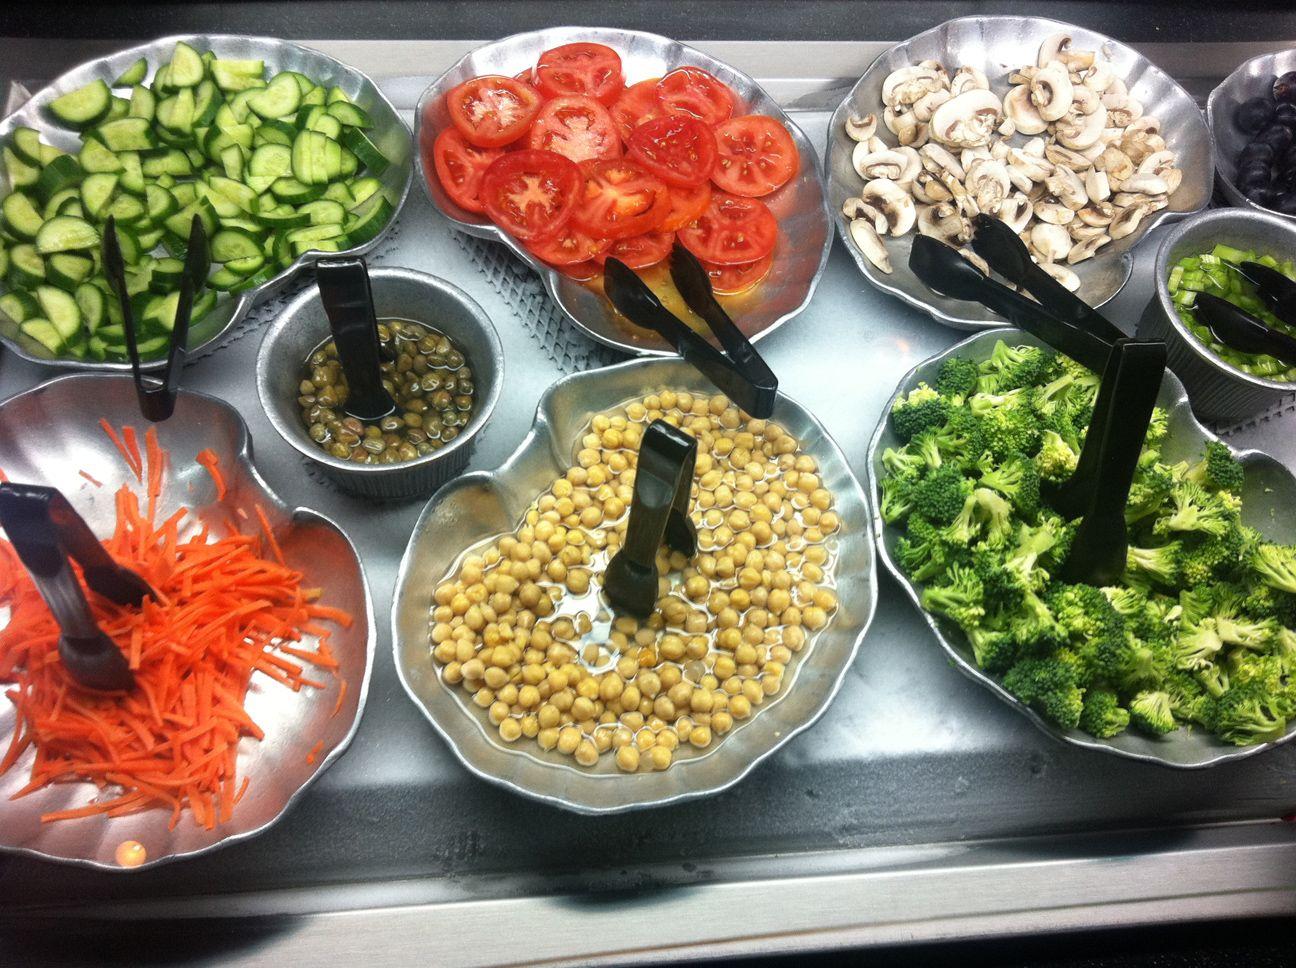 Salad Bar At Ruby Tuesday Food Food To Go Healthy Food Options